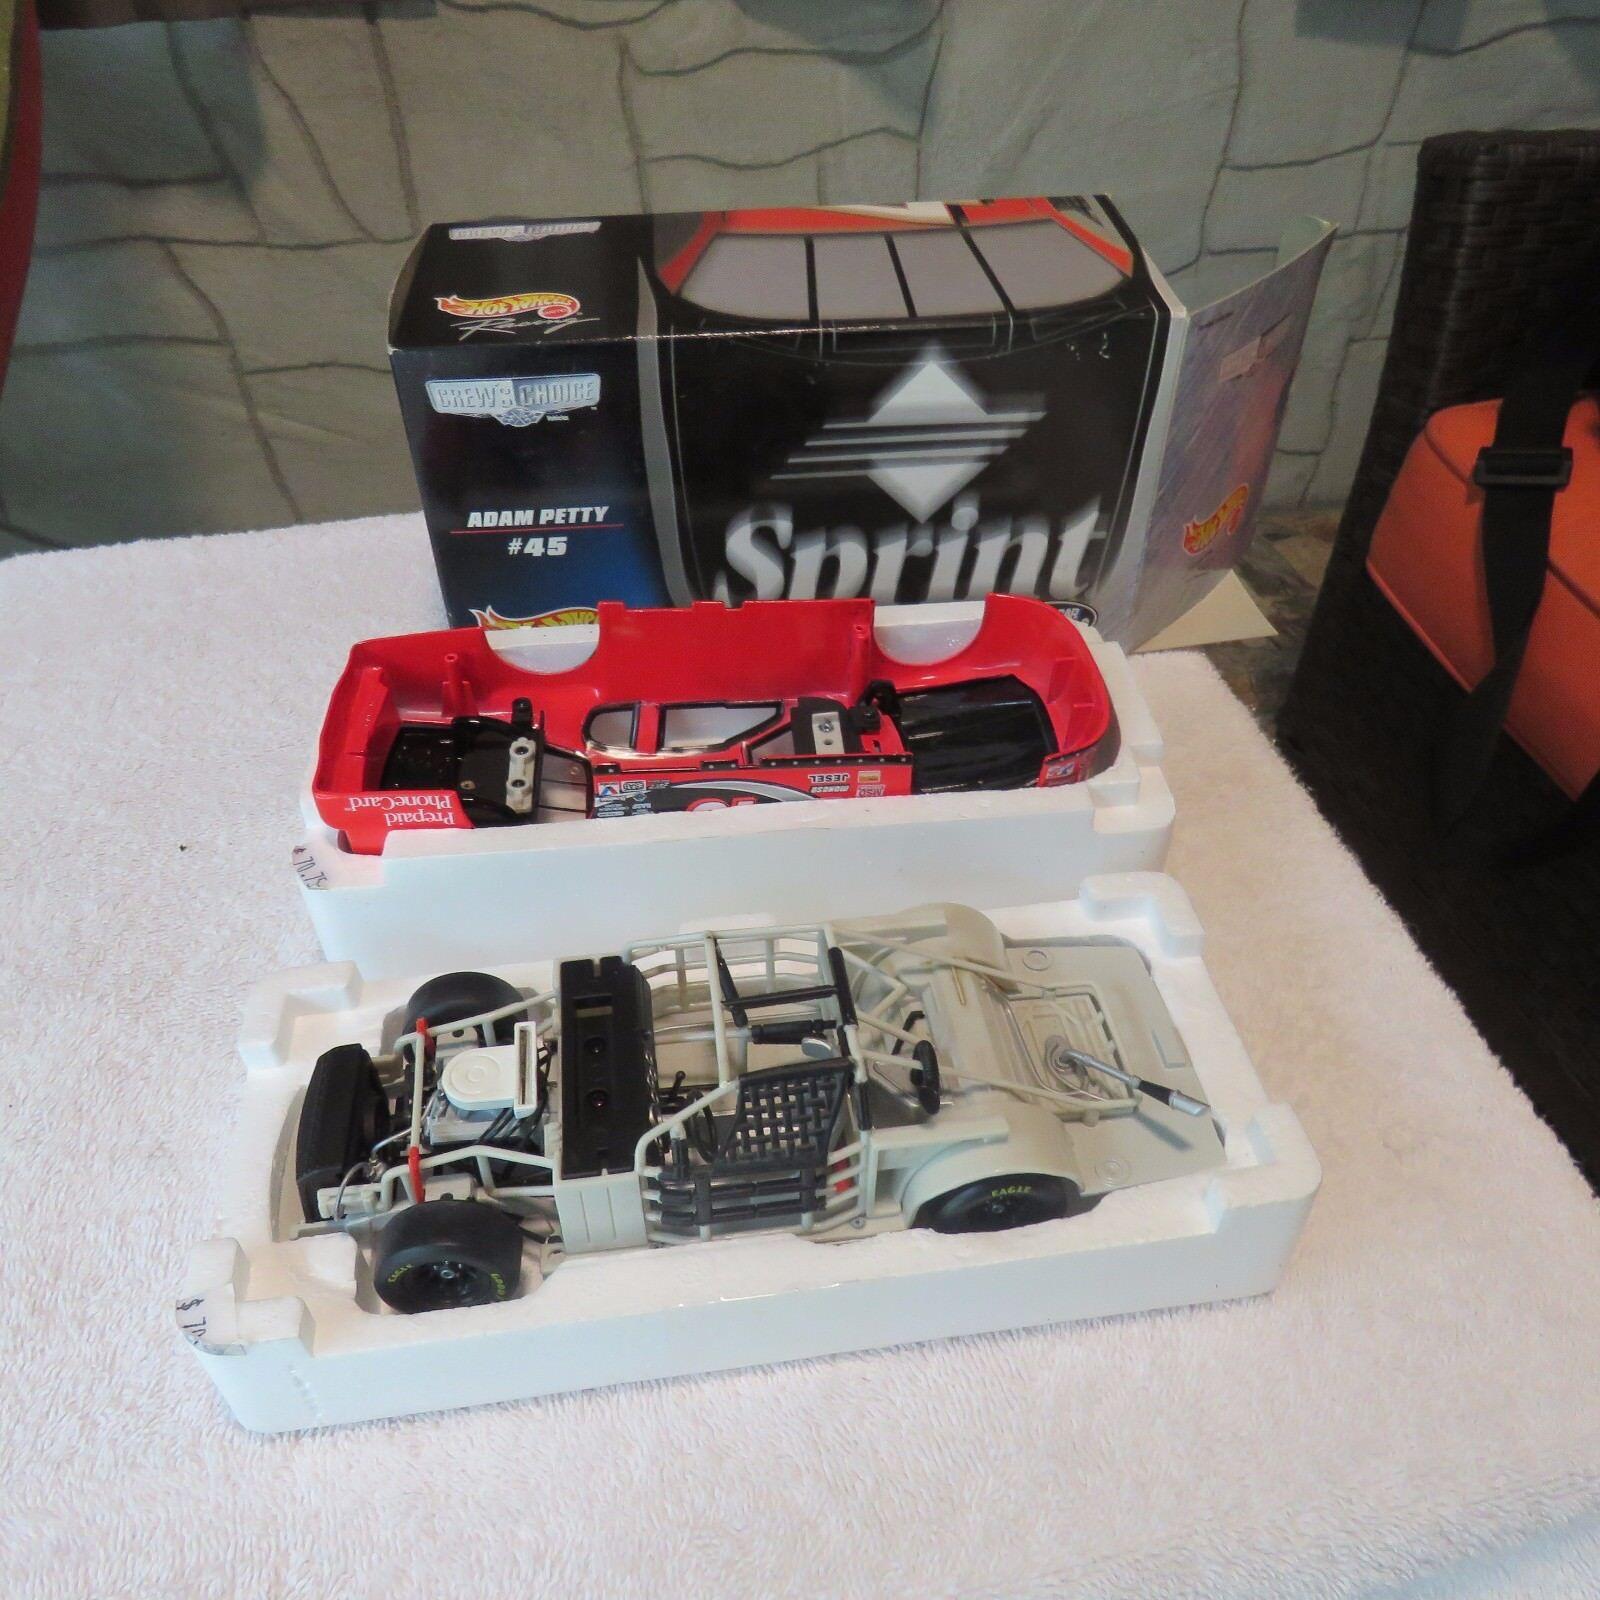 Adam Petty Sprint PCS 1 24 Scale Chevy Monte Carlo Hot Wheels Crew's Choice